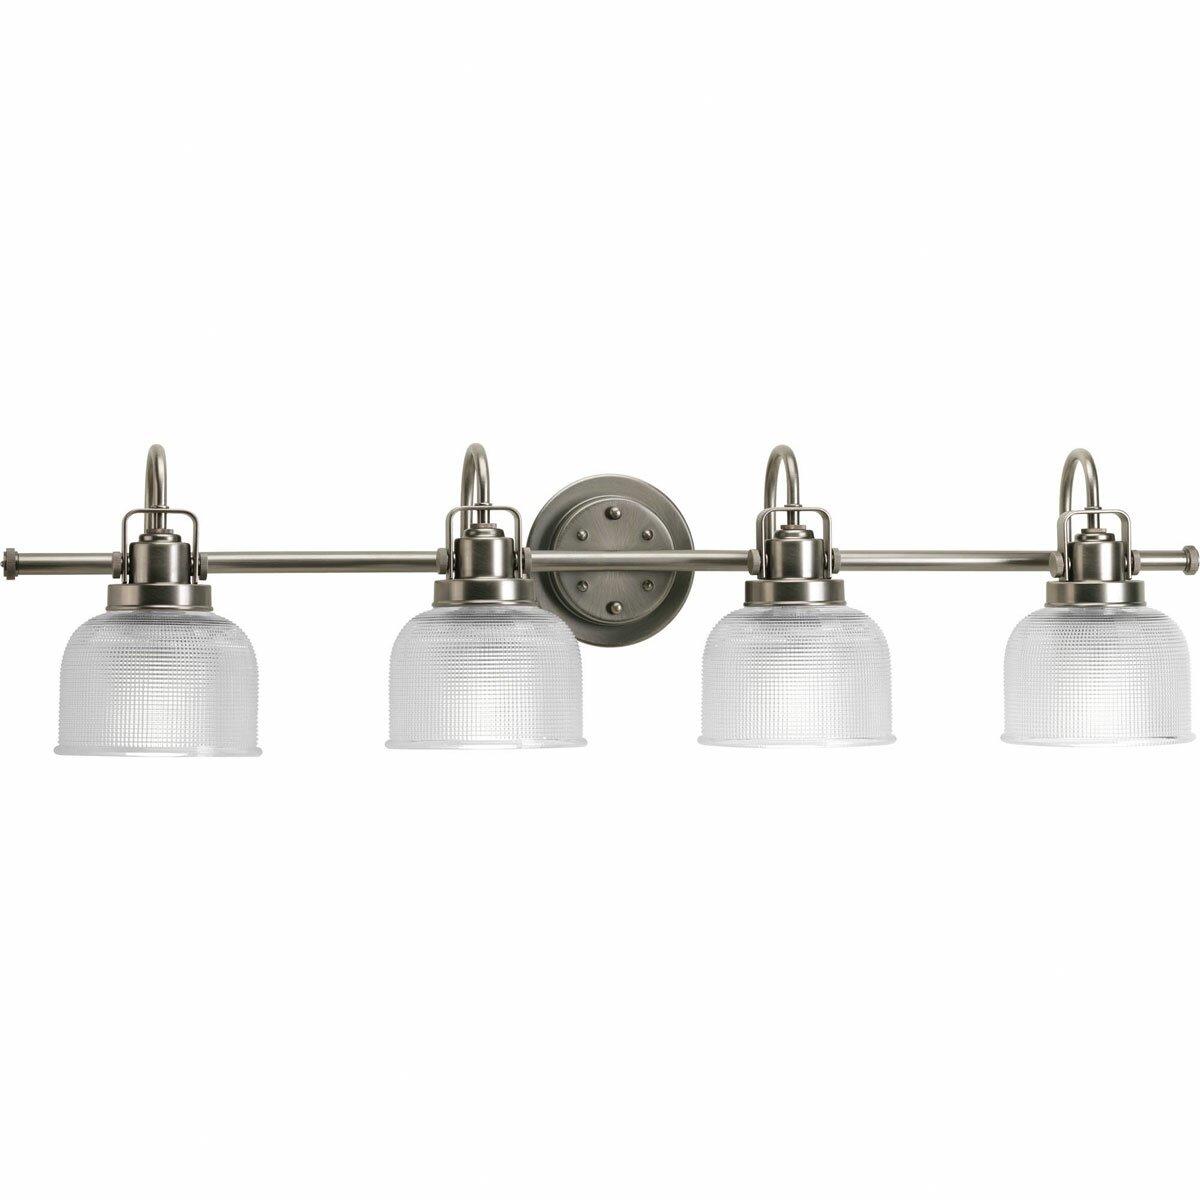 Bathroom Light Fixtures Wayfair bathroom light bar fixtures. charming bathroom lighting fixtures